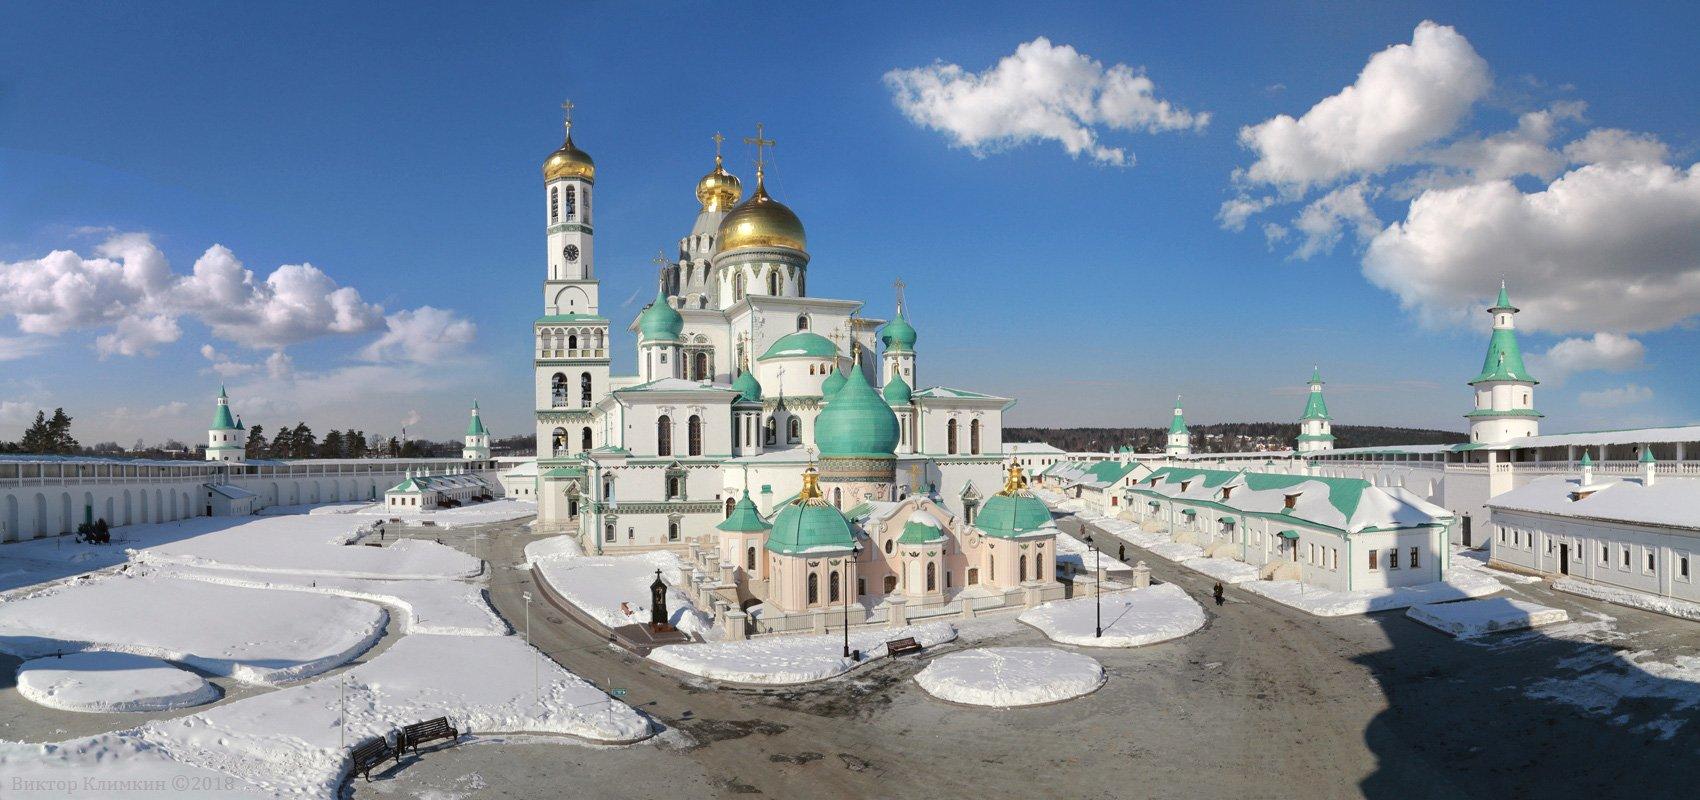 новоиерусалимский монастырь, зима, храм, Виктор Климкин